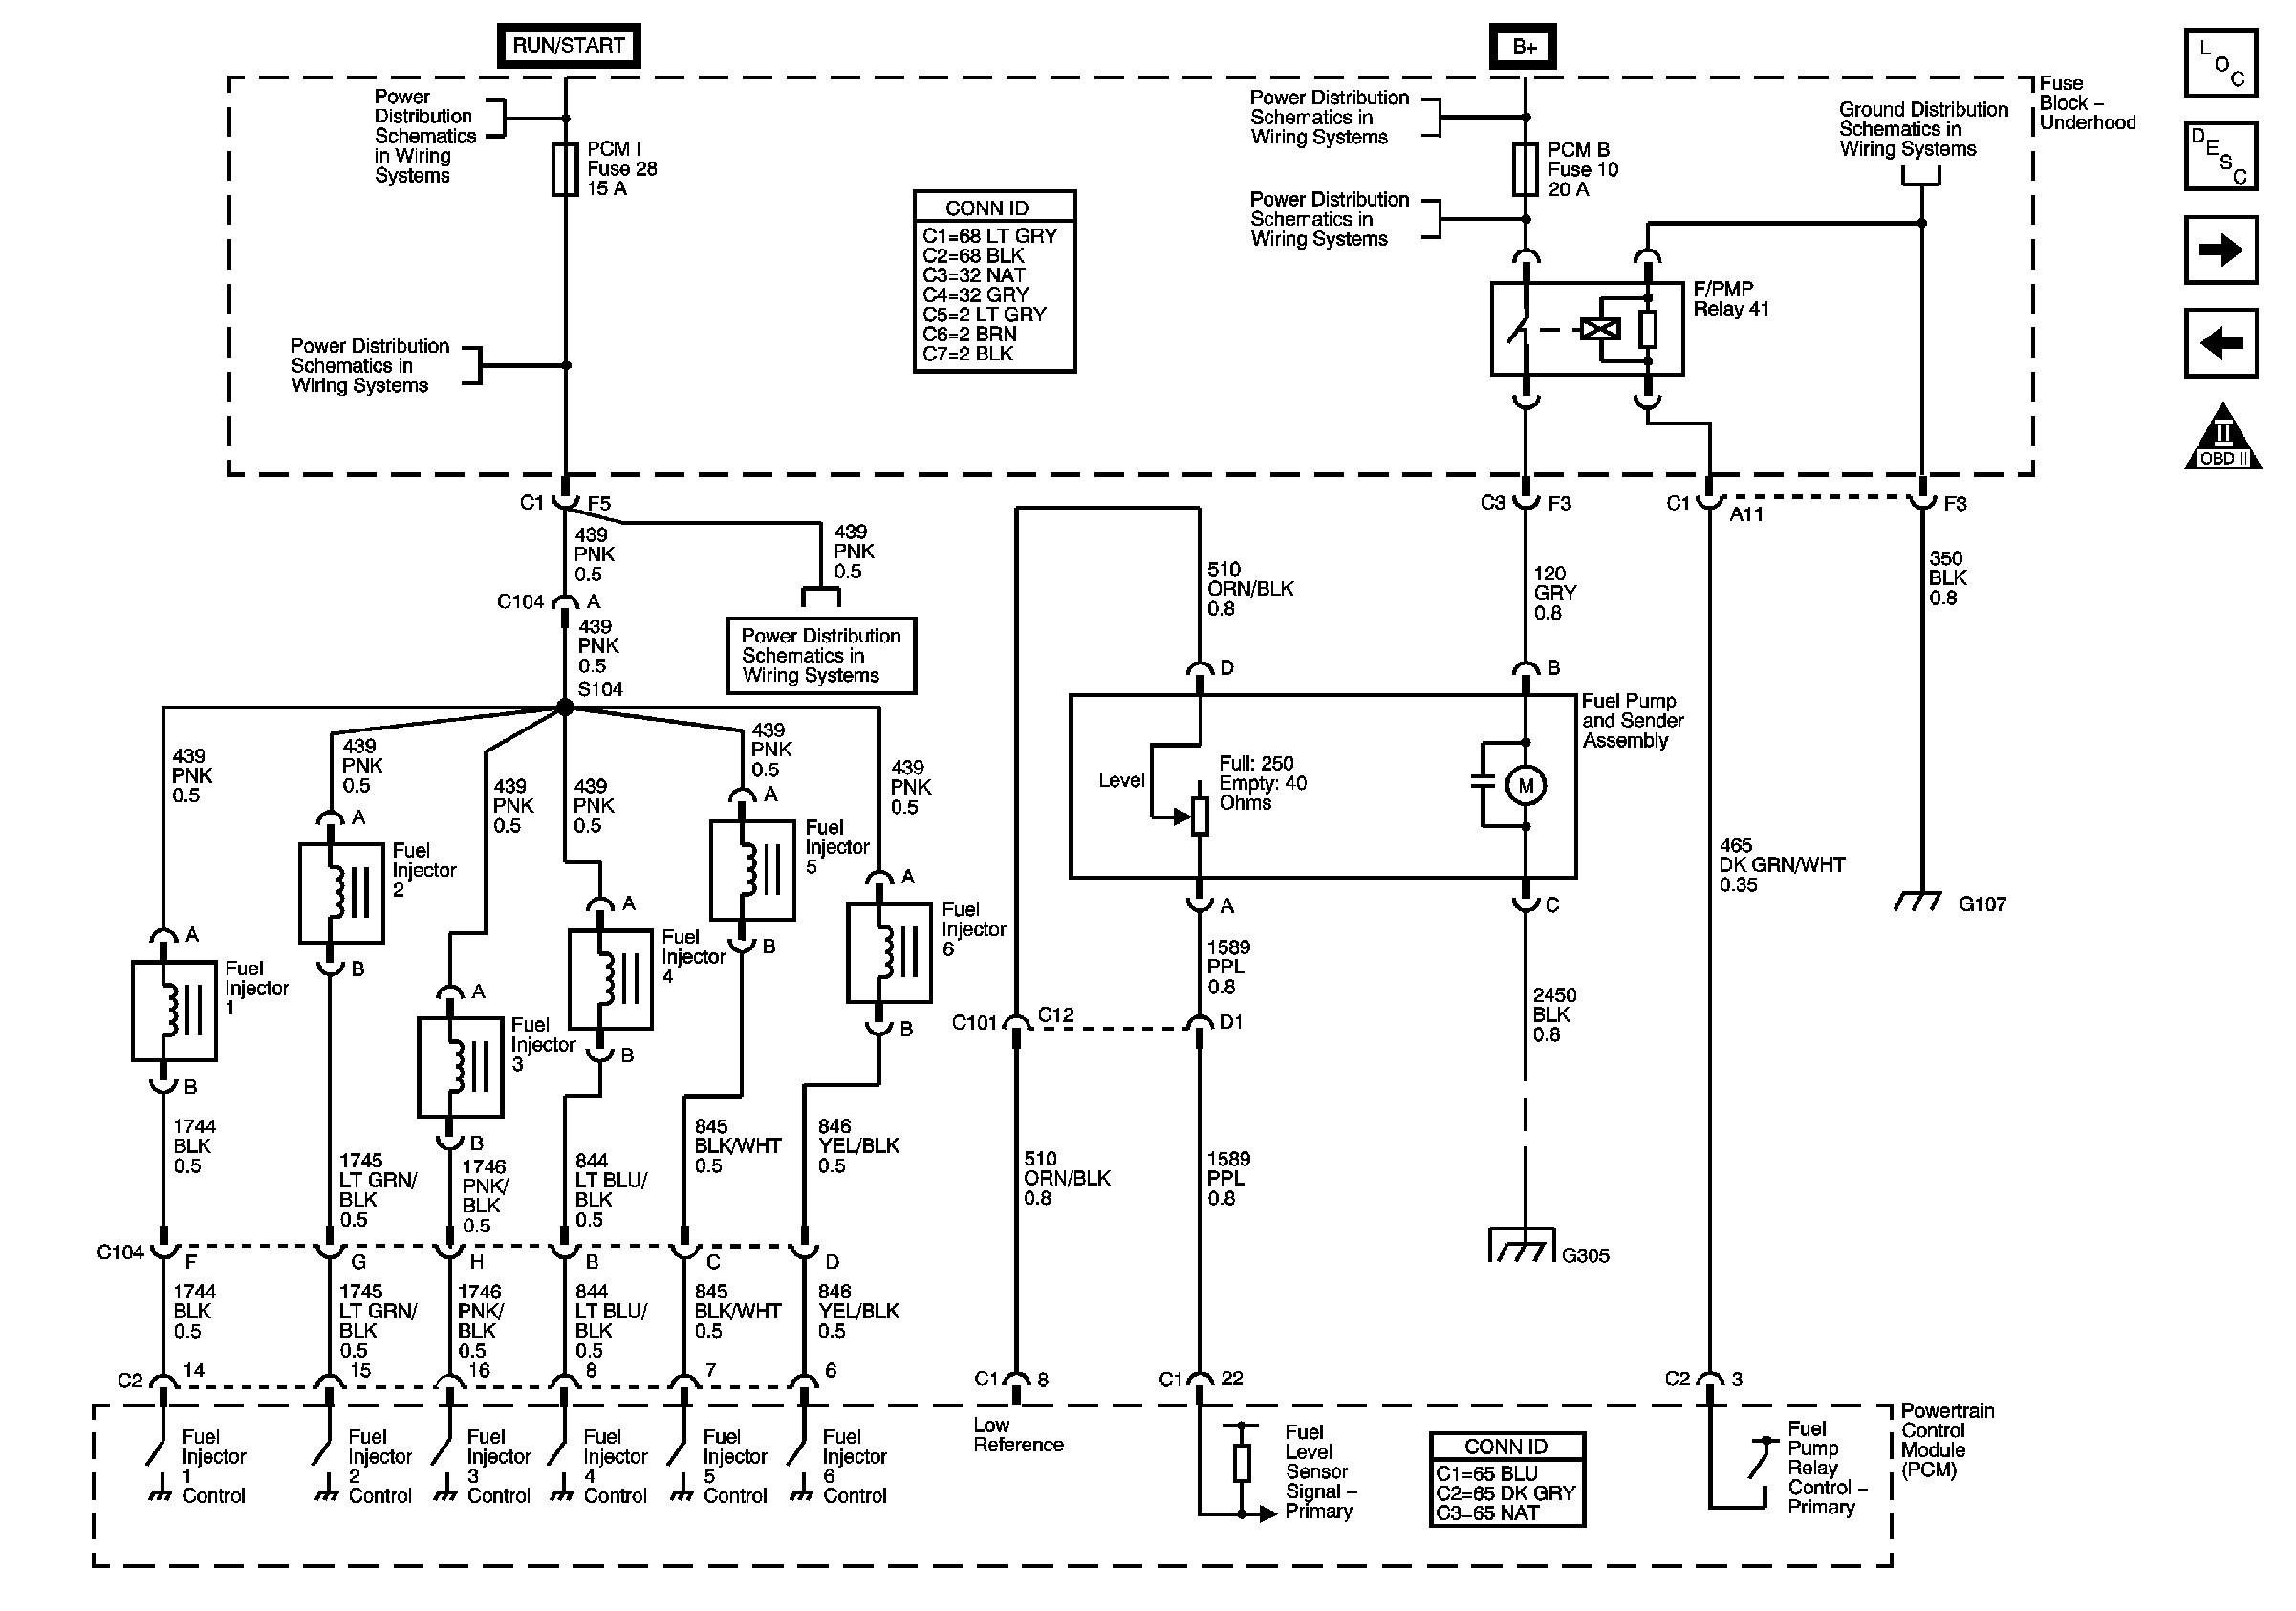 Nissan Almera 2005 Wiring Diagram 2005 Trailblazer Wiring Diagrams Wiring Diagram Provider Of Nissan Almera 2005 Wiring Diagram